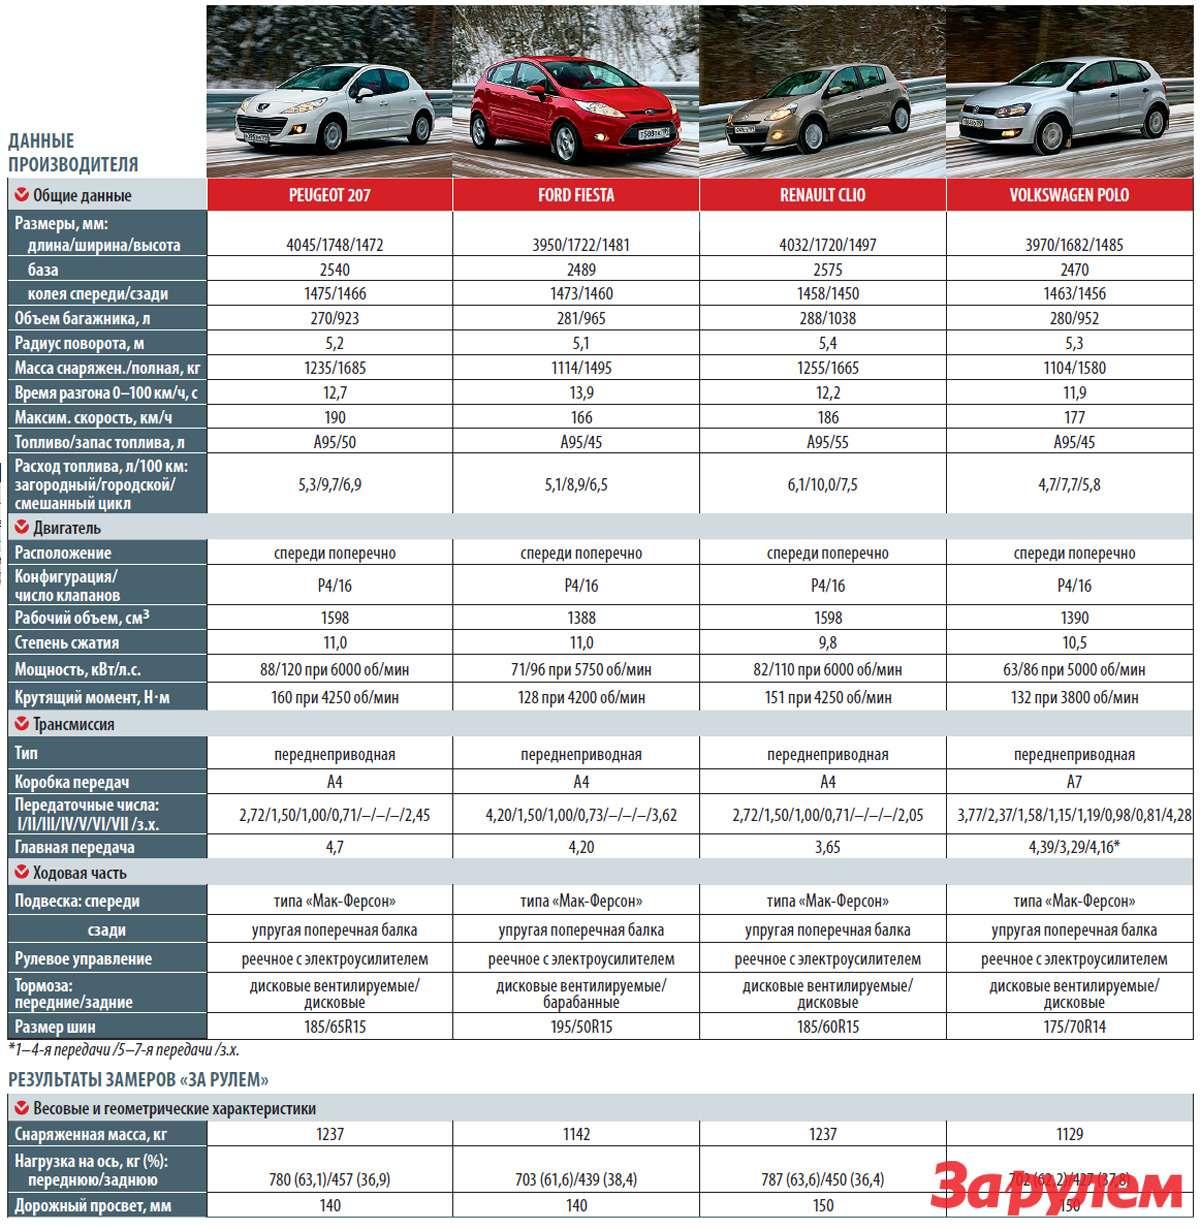 Peugeot 207, Ford Fiesta, Renault Clio, Volkswagen Polo